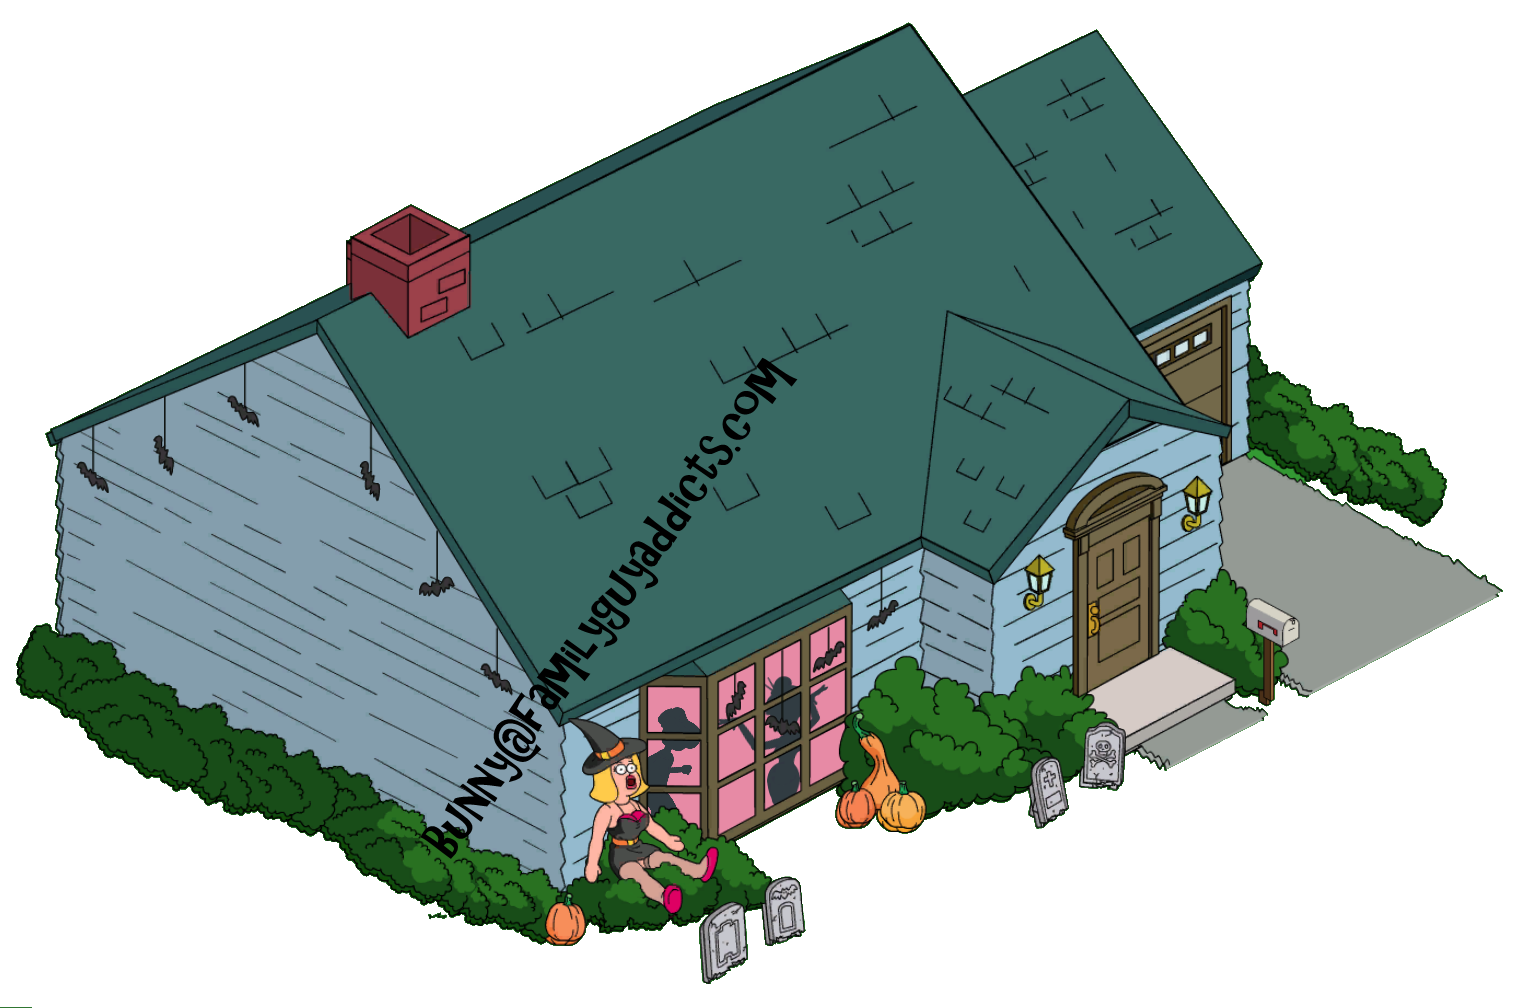 House decorations for halloween - Quagmire S House Halloween Decorations Typical Glenn Blowup Doll